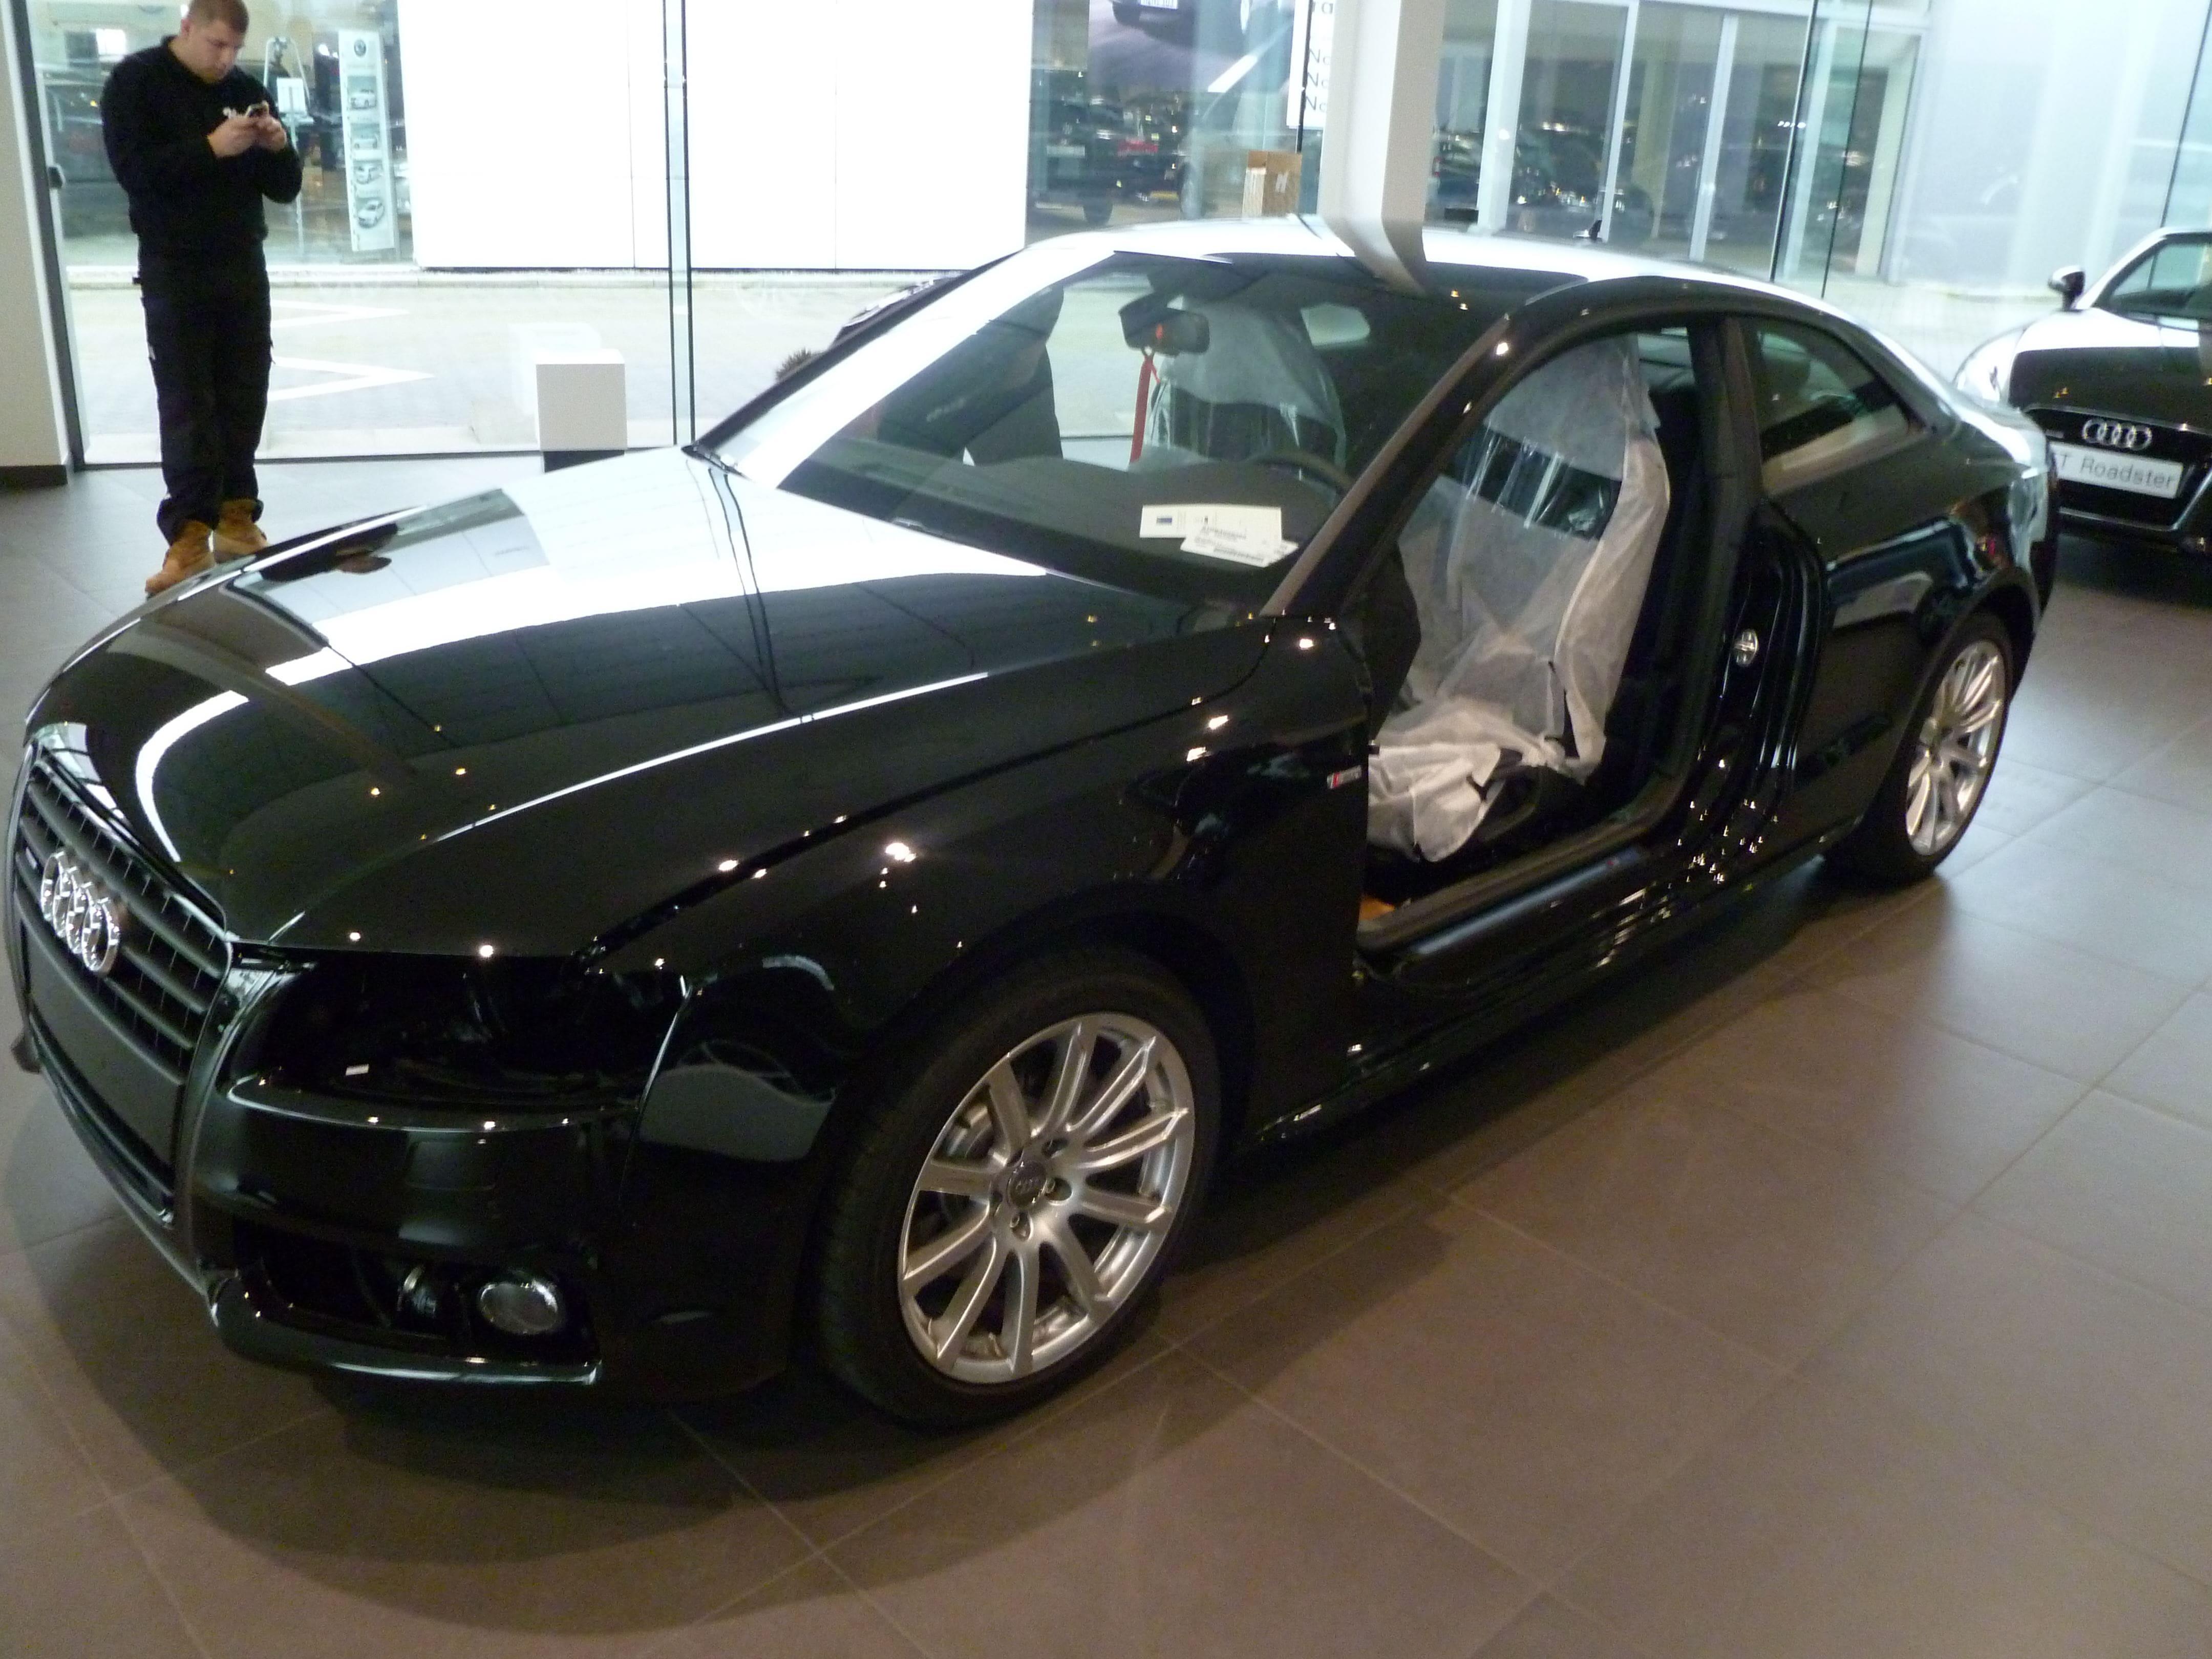 Audi A5 Coupe met Mat Zwarte Wrap, Carwrapping door Wrapmyride.nu Foto-nr:4611, ©2021